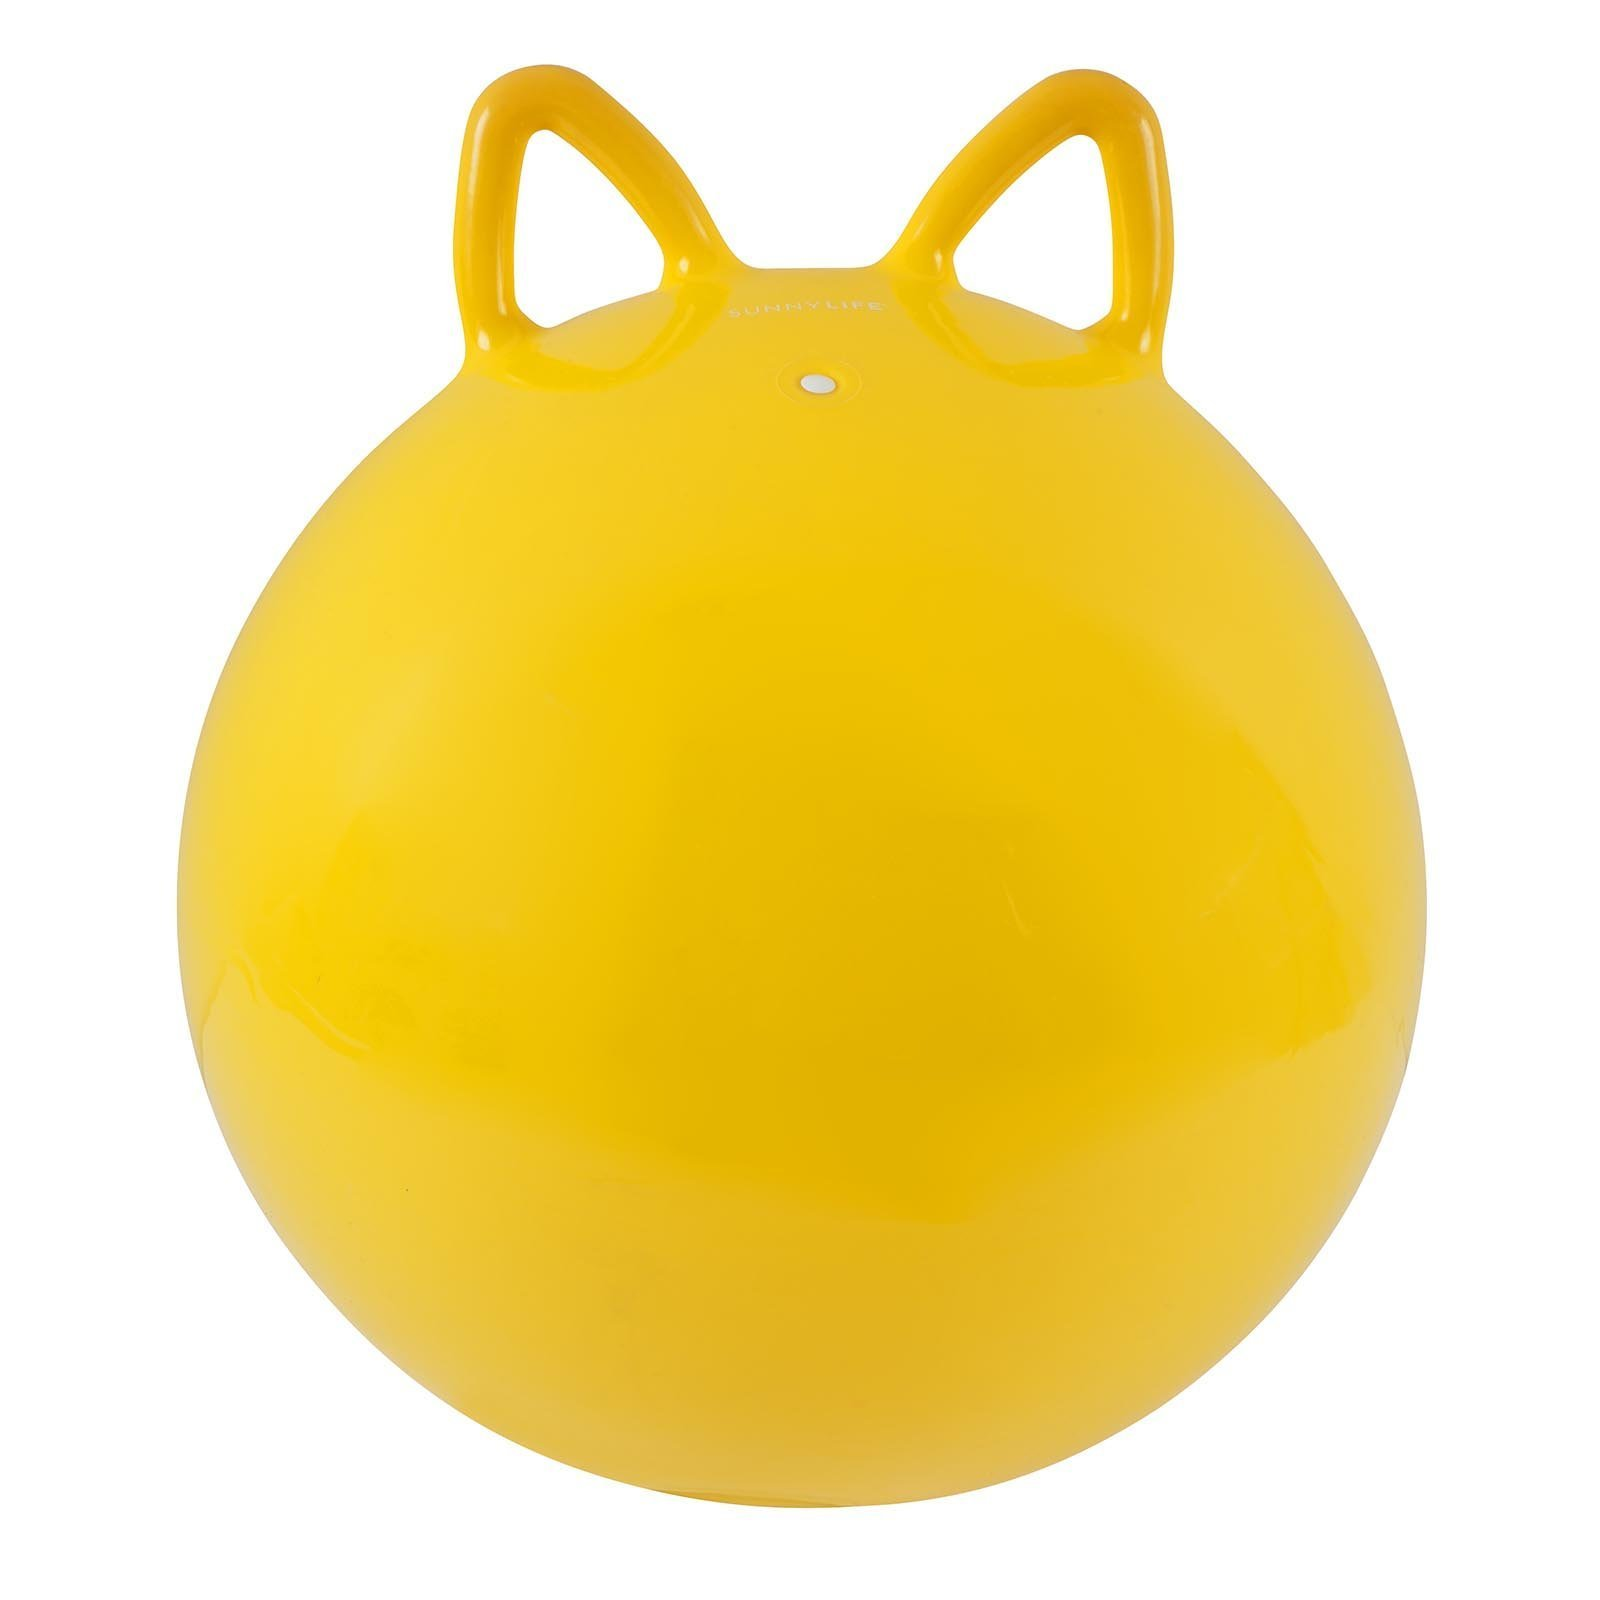 Sunnylife Hopper Ball - Ducky image